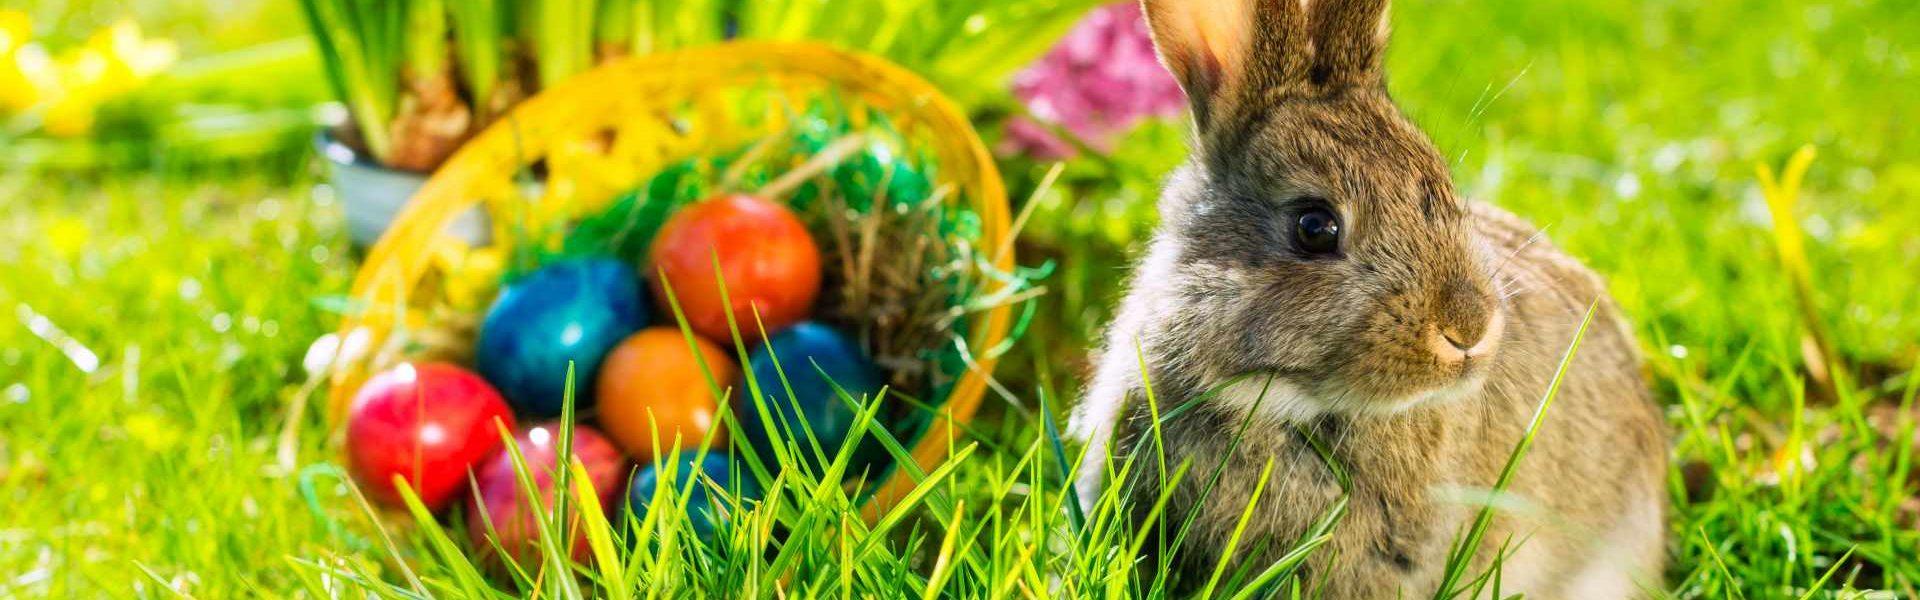 Egg Cellent Travels The Top 10 Easter Egg Hunts Around The World Hotelscombined Egg Cellent Travels The Top 10 Easter Egg Hunts Around The World